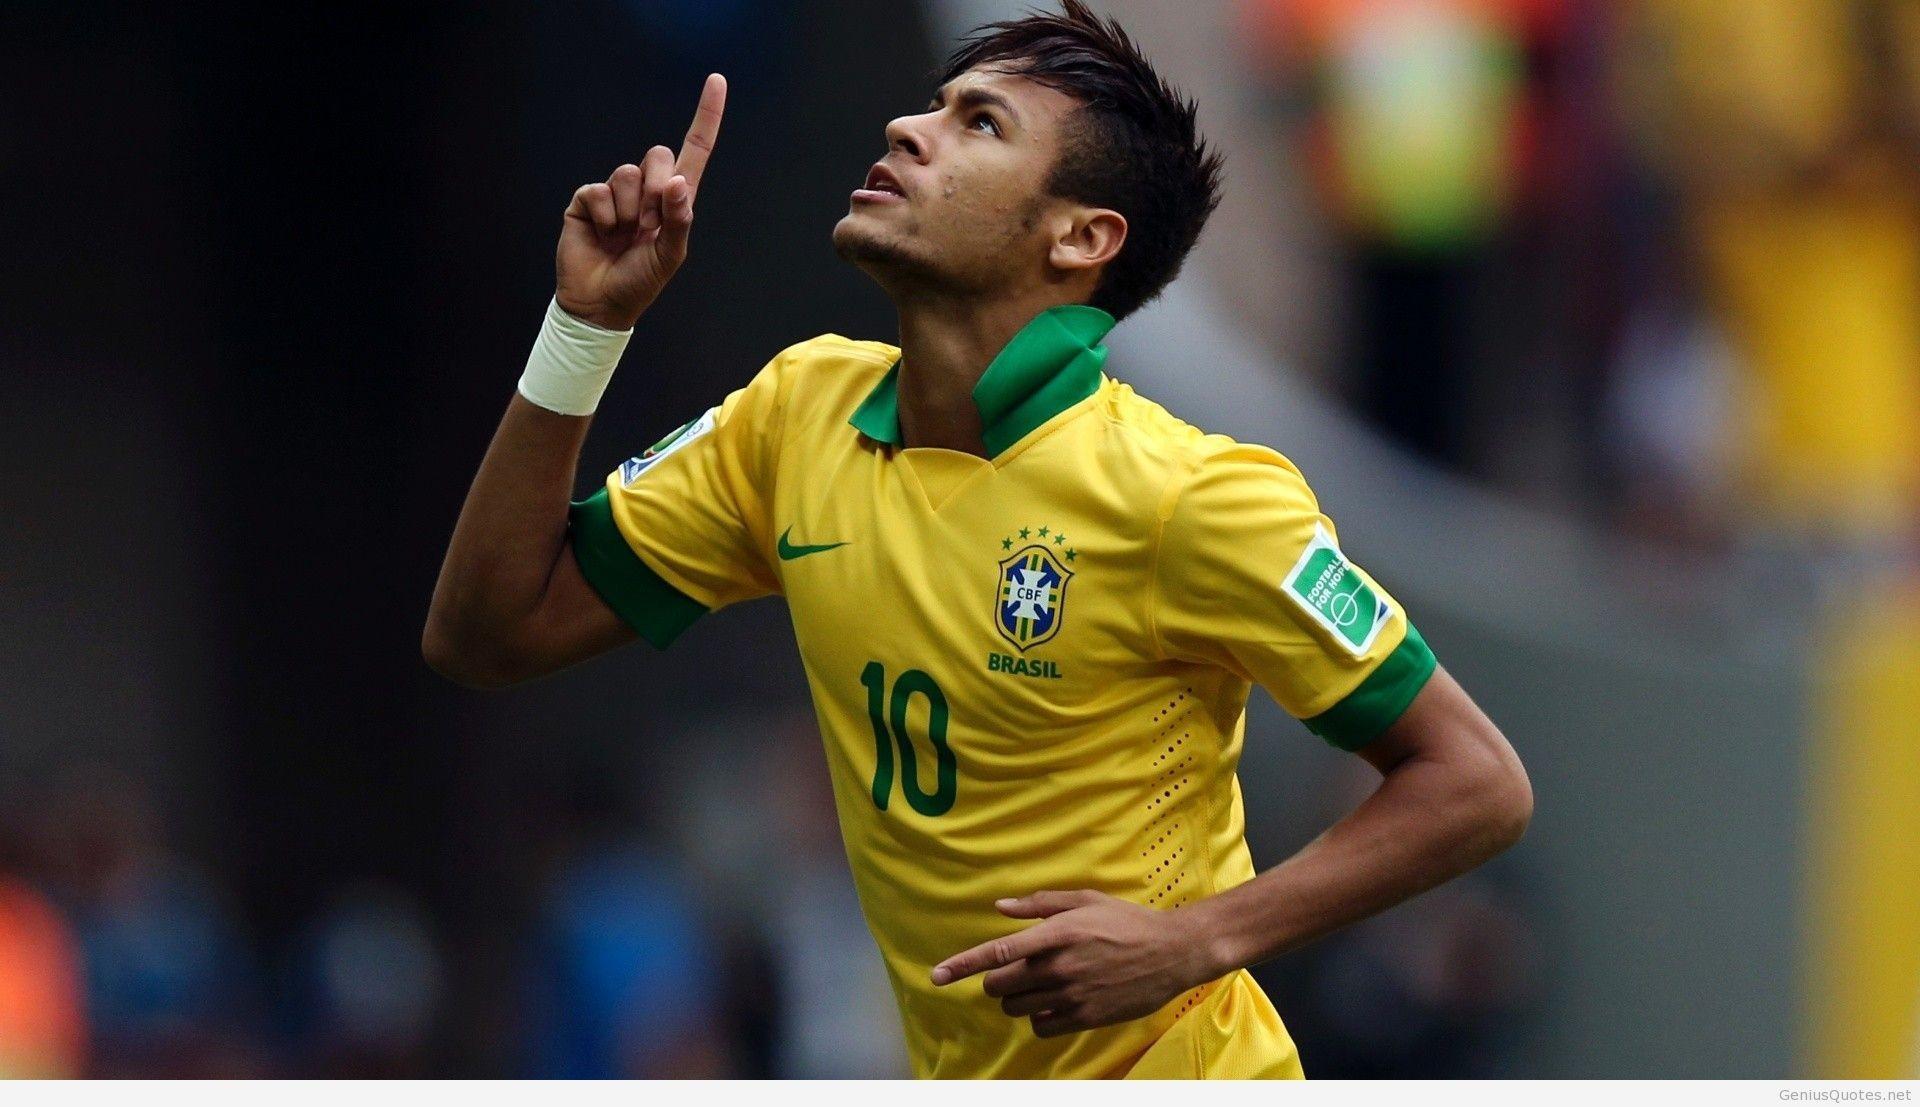 … neymar-wallpaper-brazil-7 …